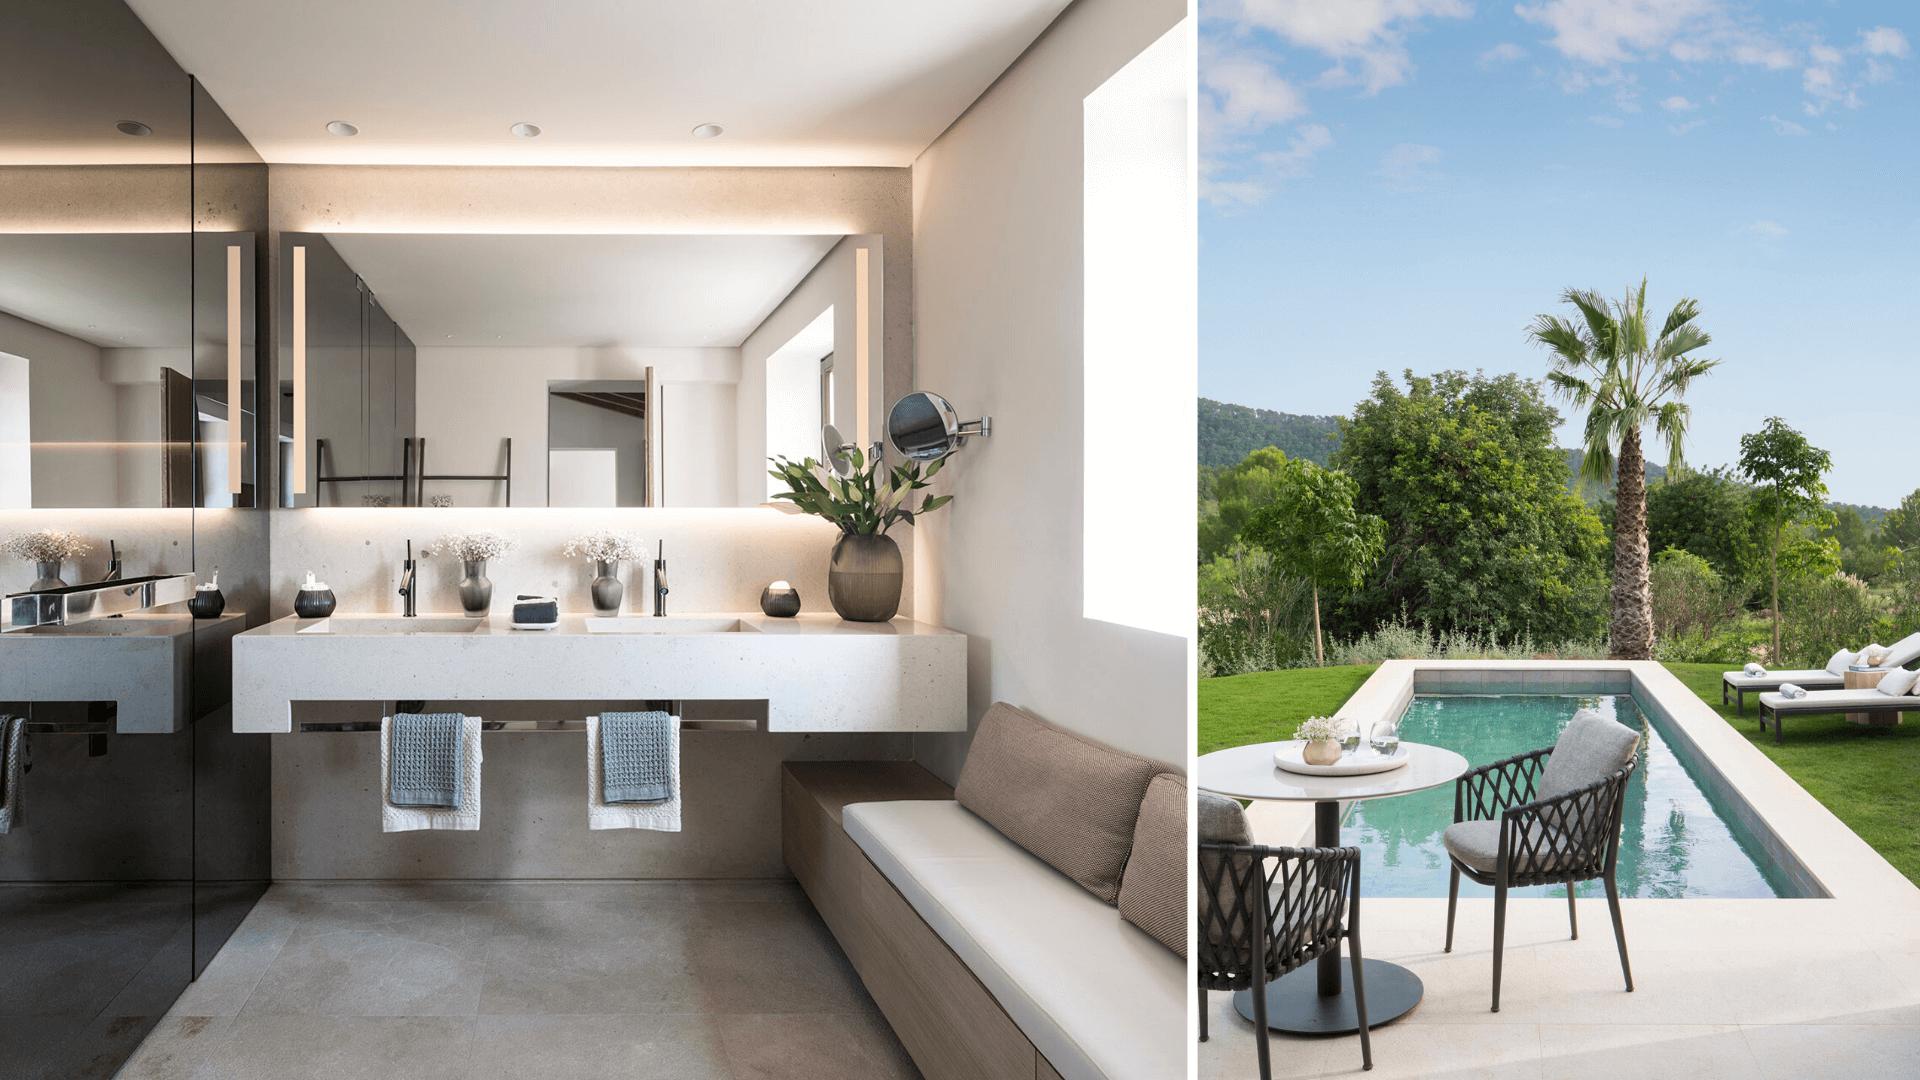 Pool Suites Castell Son Claret Hotel, Mallorca (5)